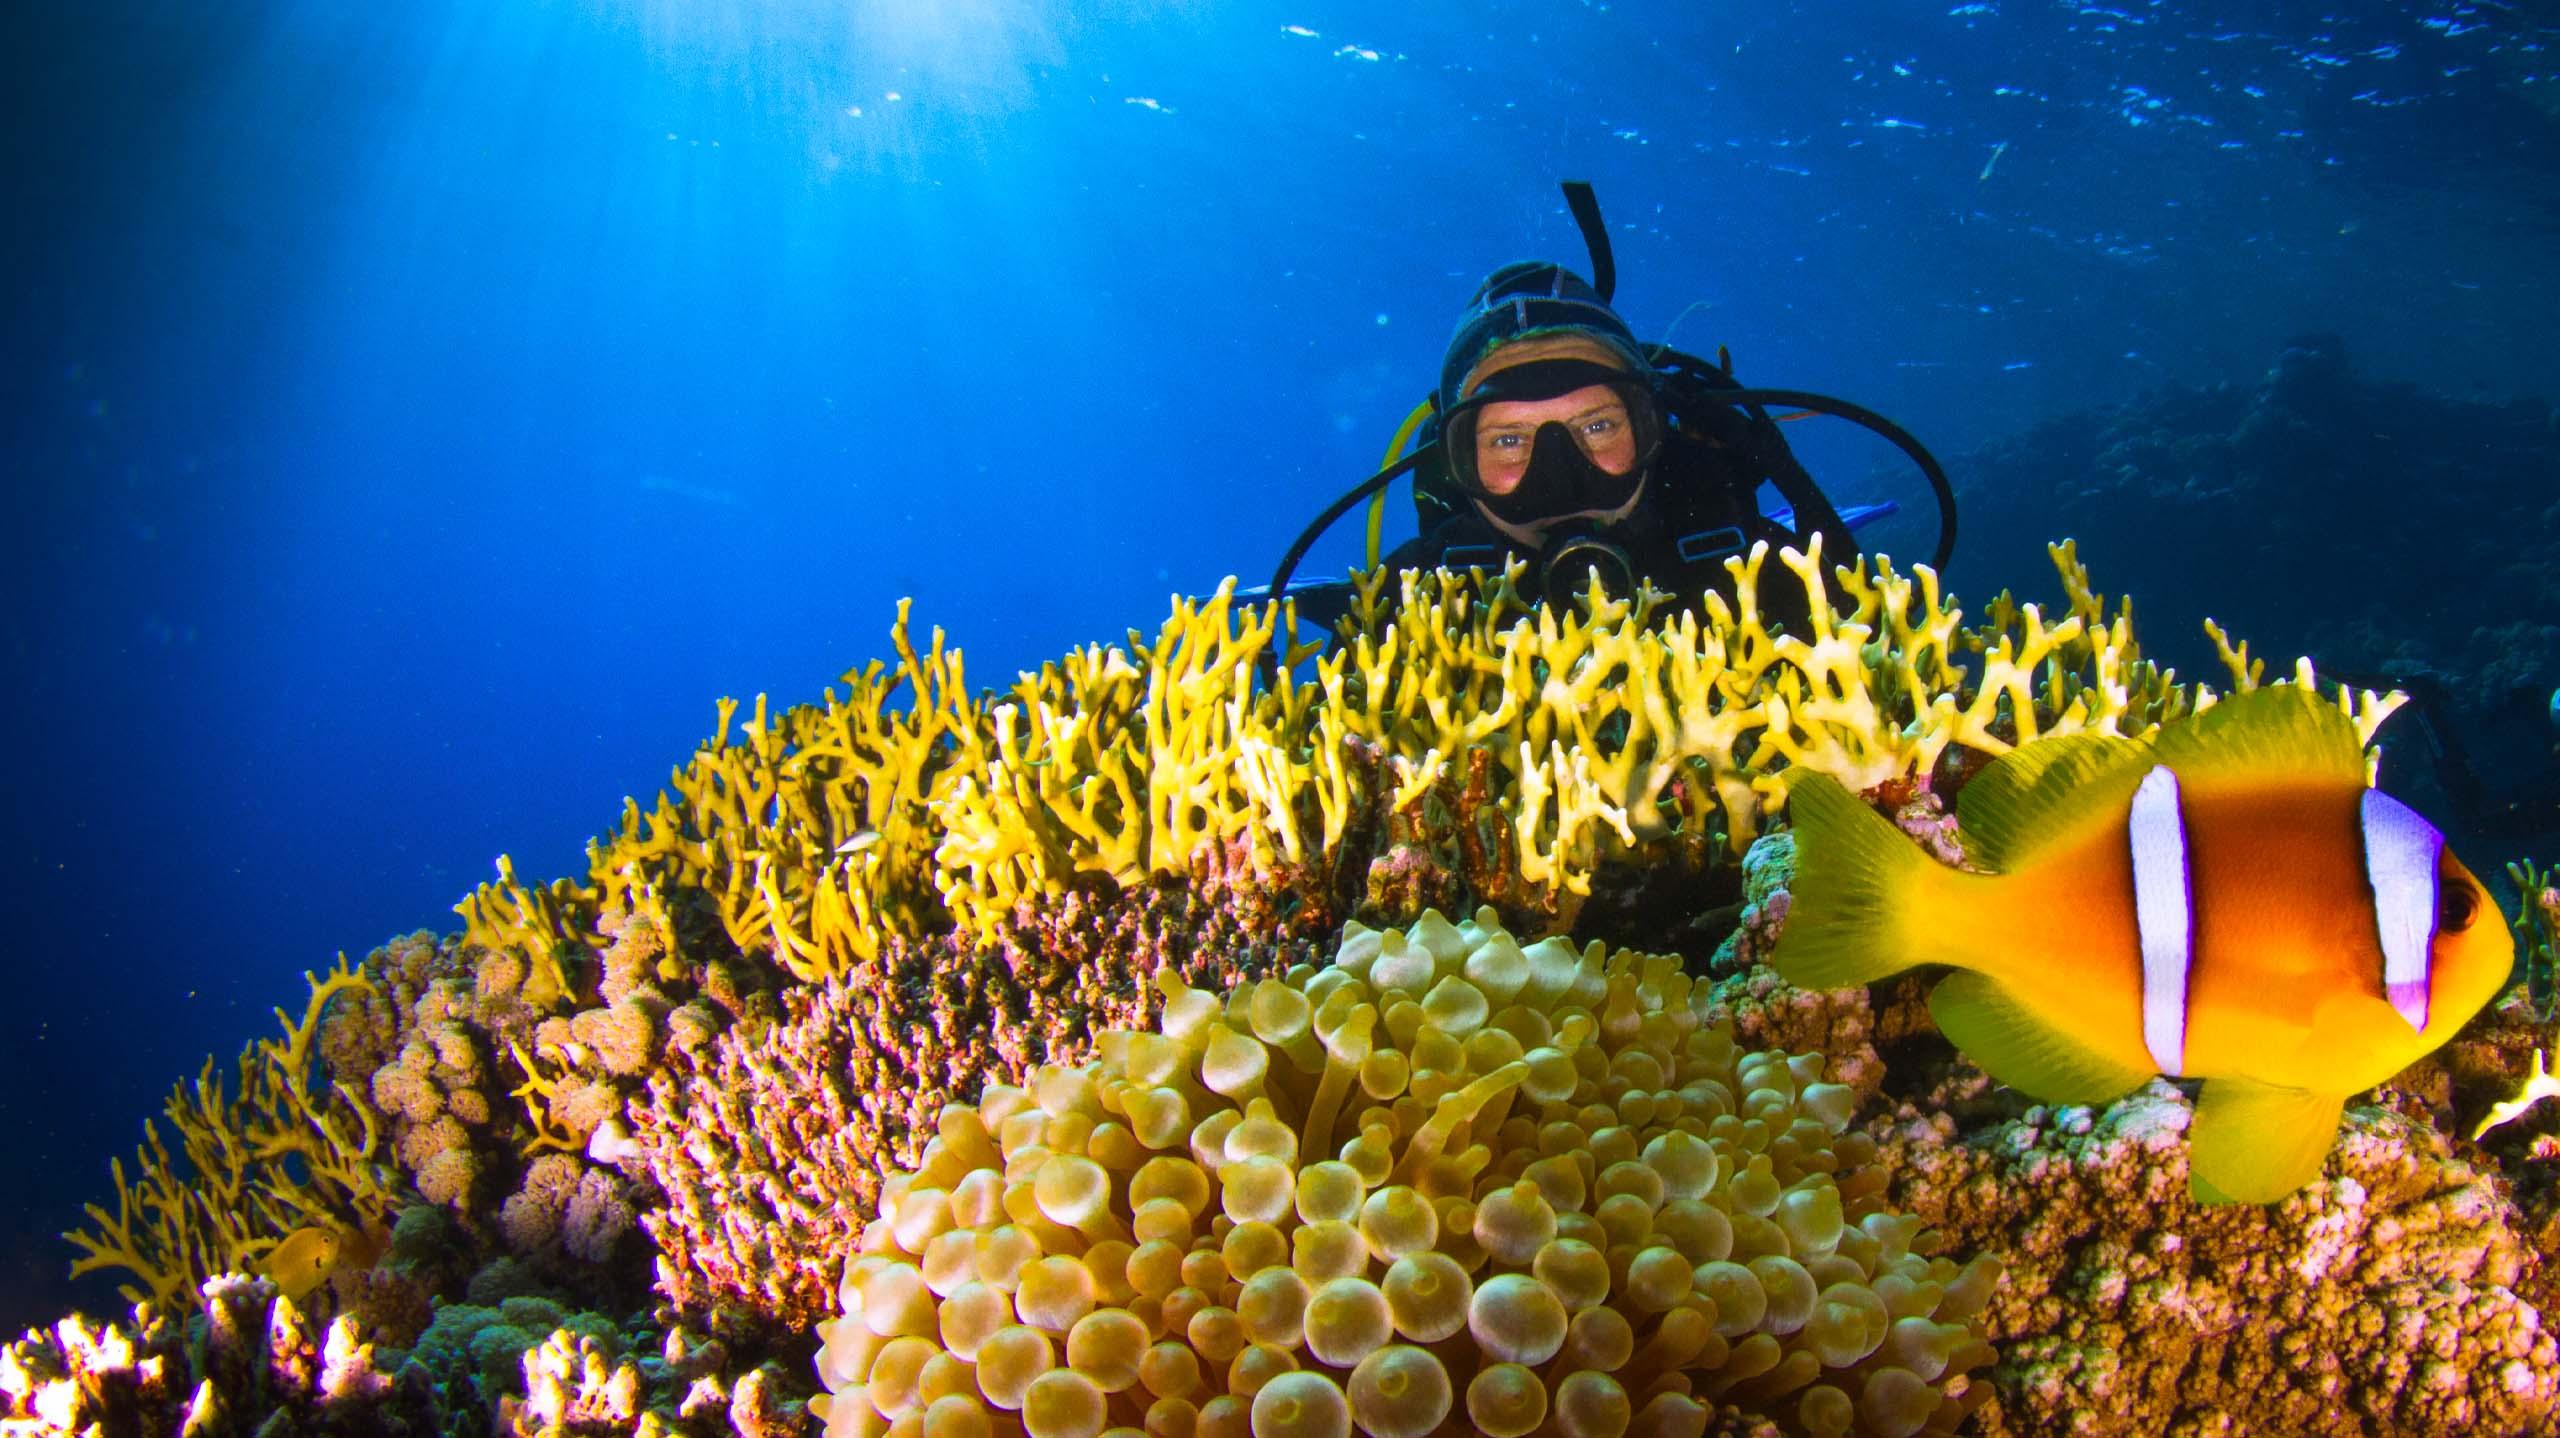 Scuba diver exploring Egyption coral reef